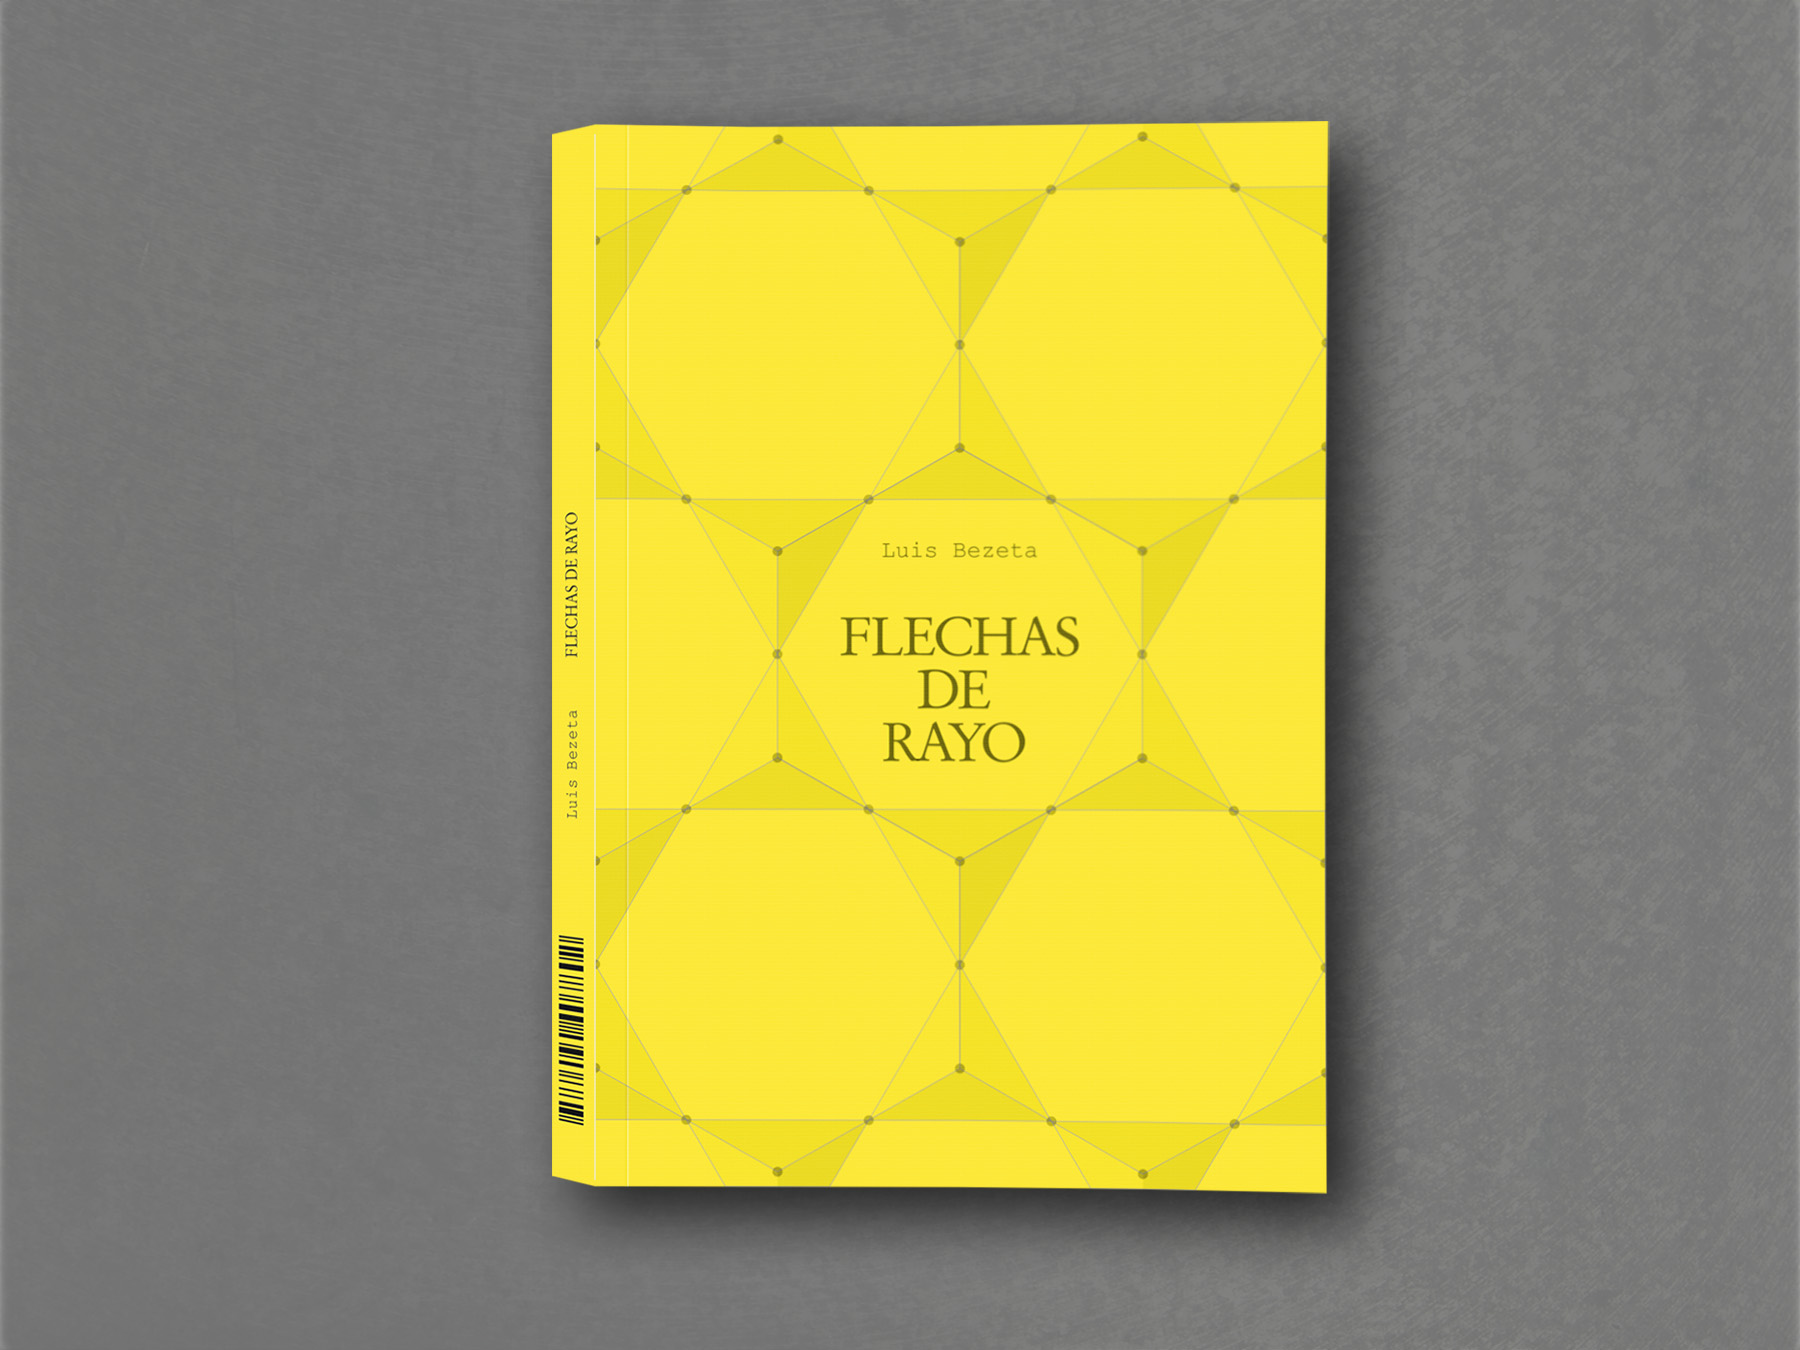 Luis bezeta - MKYC - FLECHAS DE RAYO